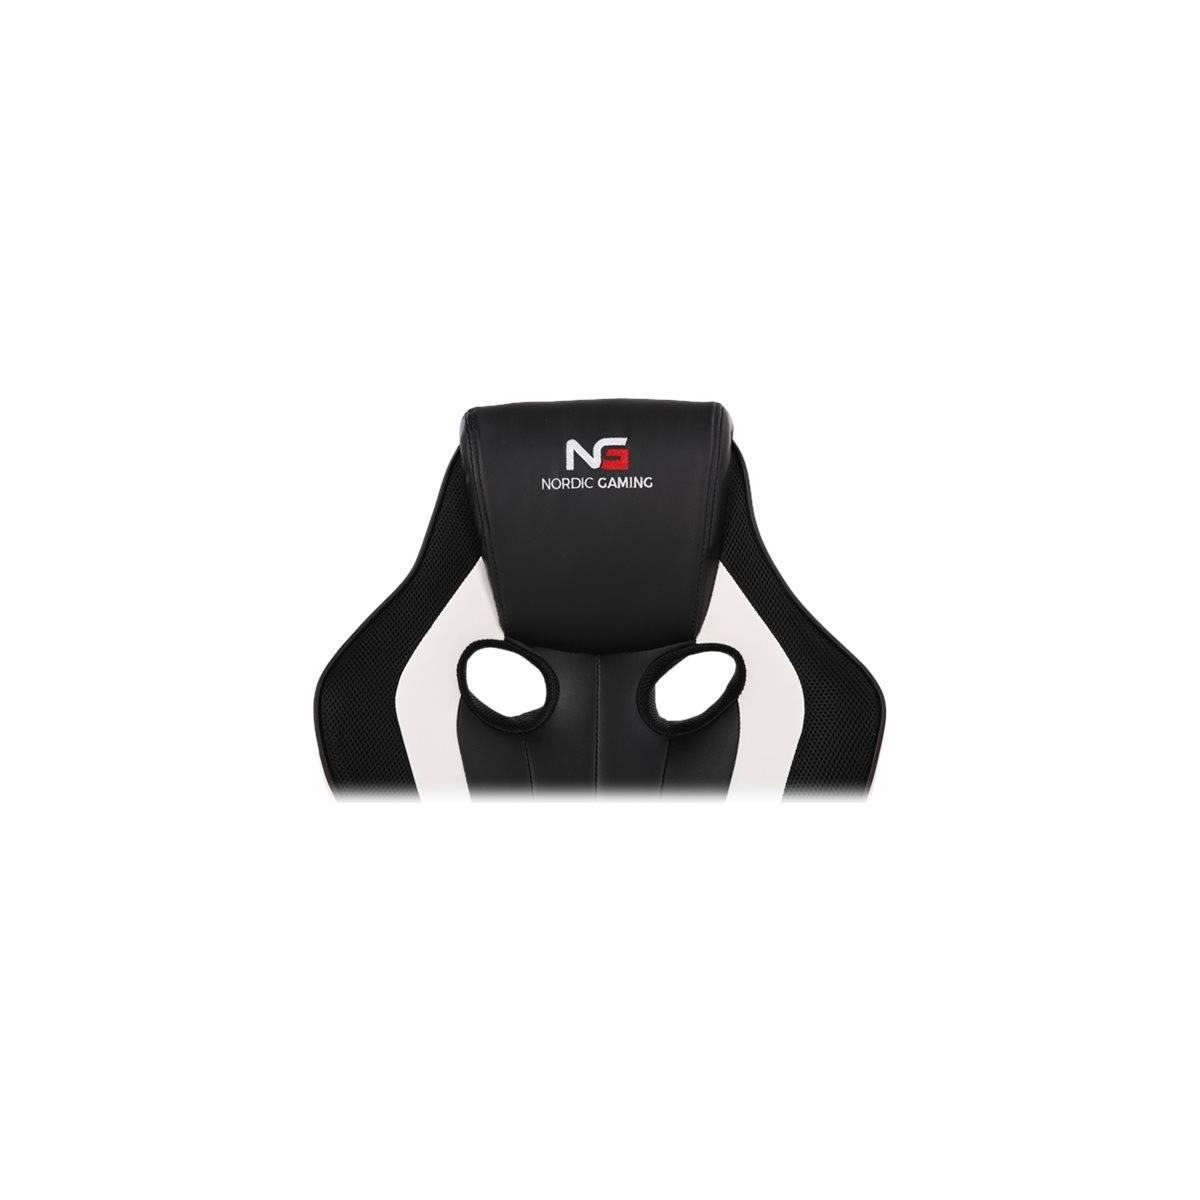 Nordic Gaming Challenger Mackabler.no fra Nordic